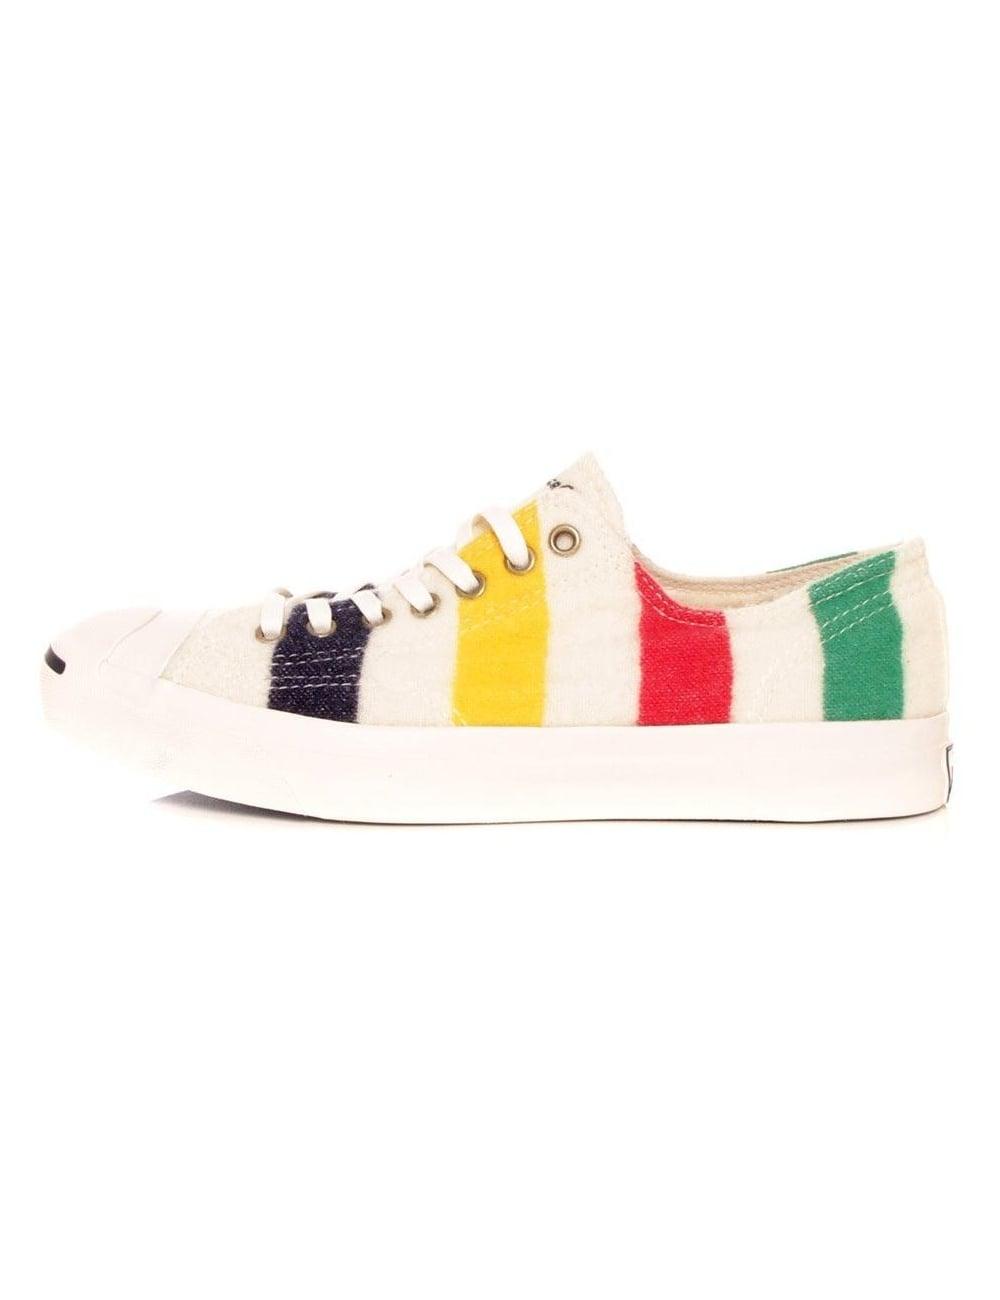 c9185b5ee Converse Jack Purcell Jack Purcell LTT OX - Hudson Bay - Footwear ...